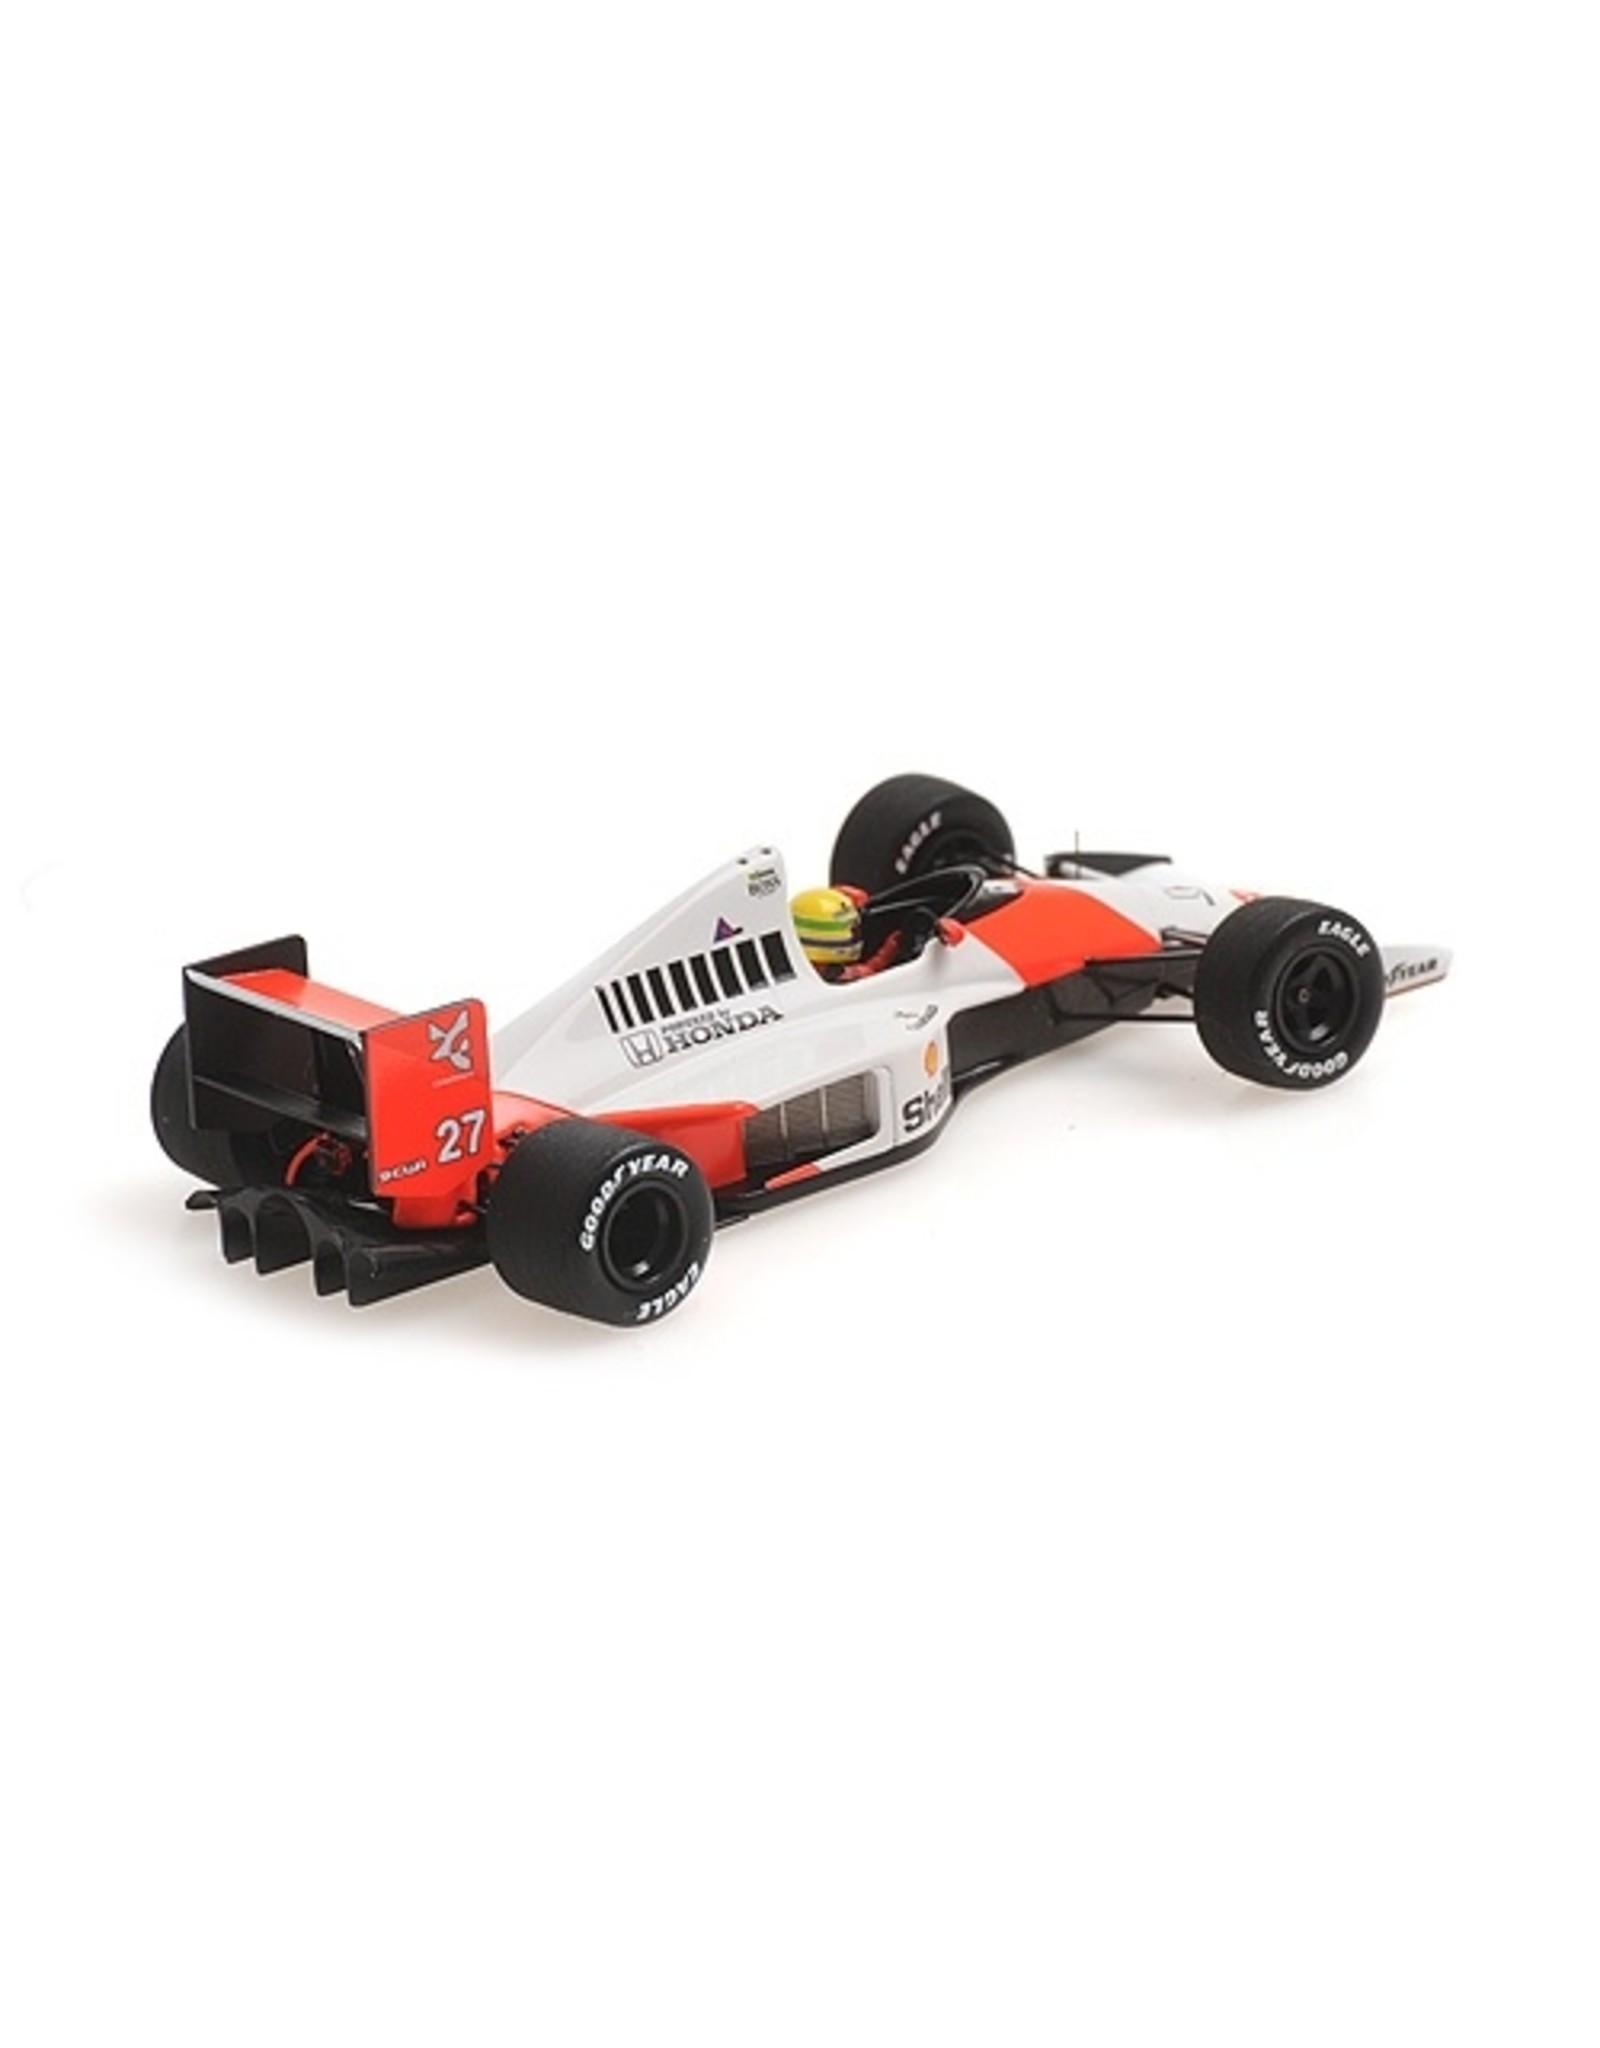 Formule 1 McLaren Honda MP4/5B #27 Winner German GP 1990  - 1:43 - Minichamps